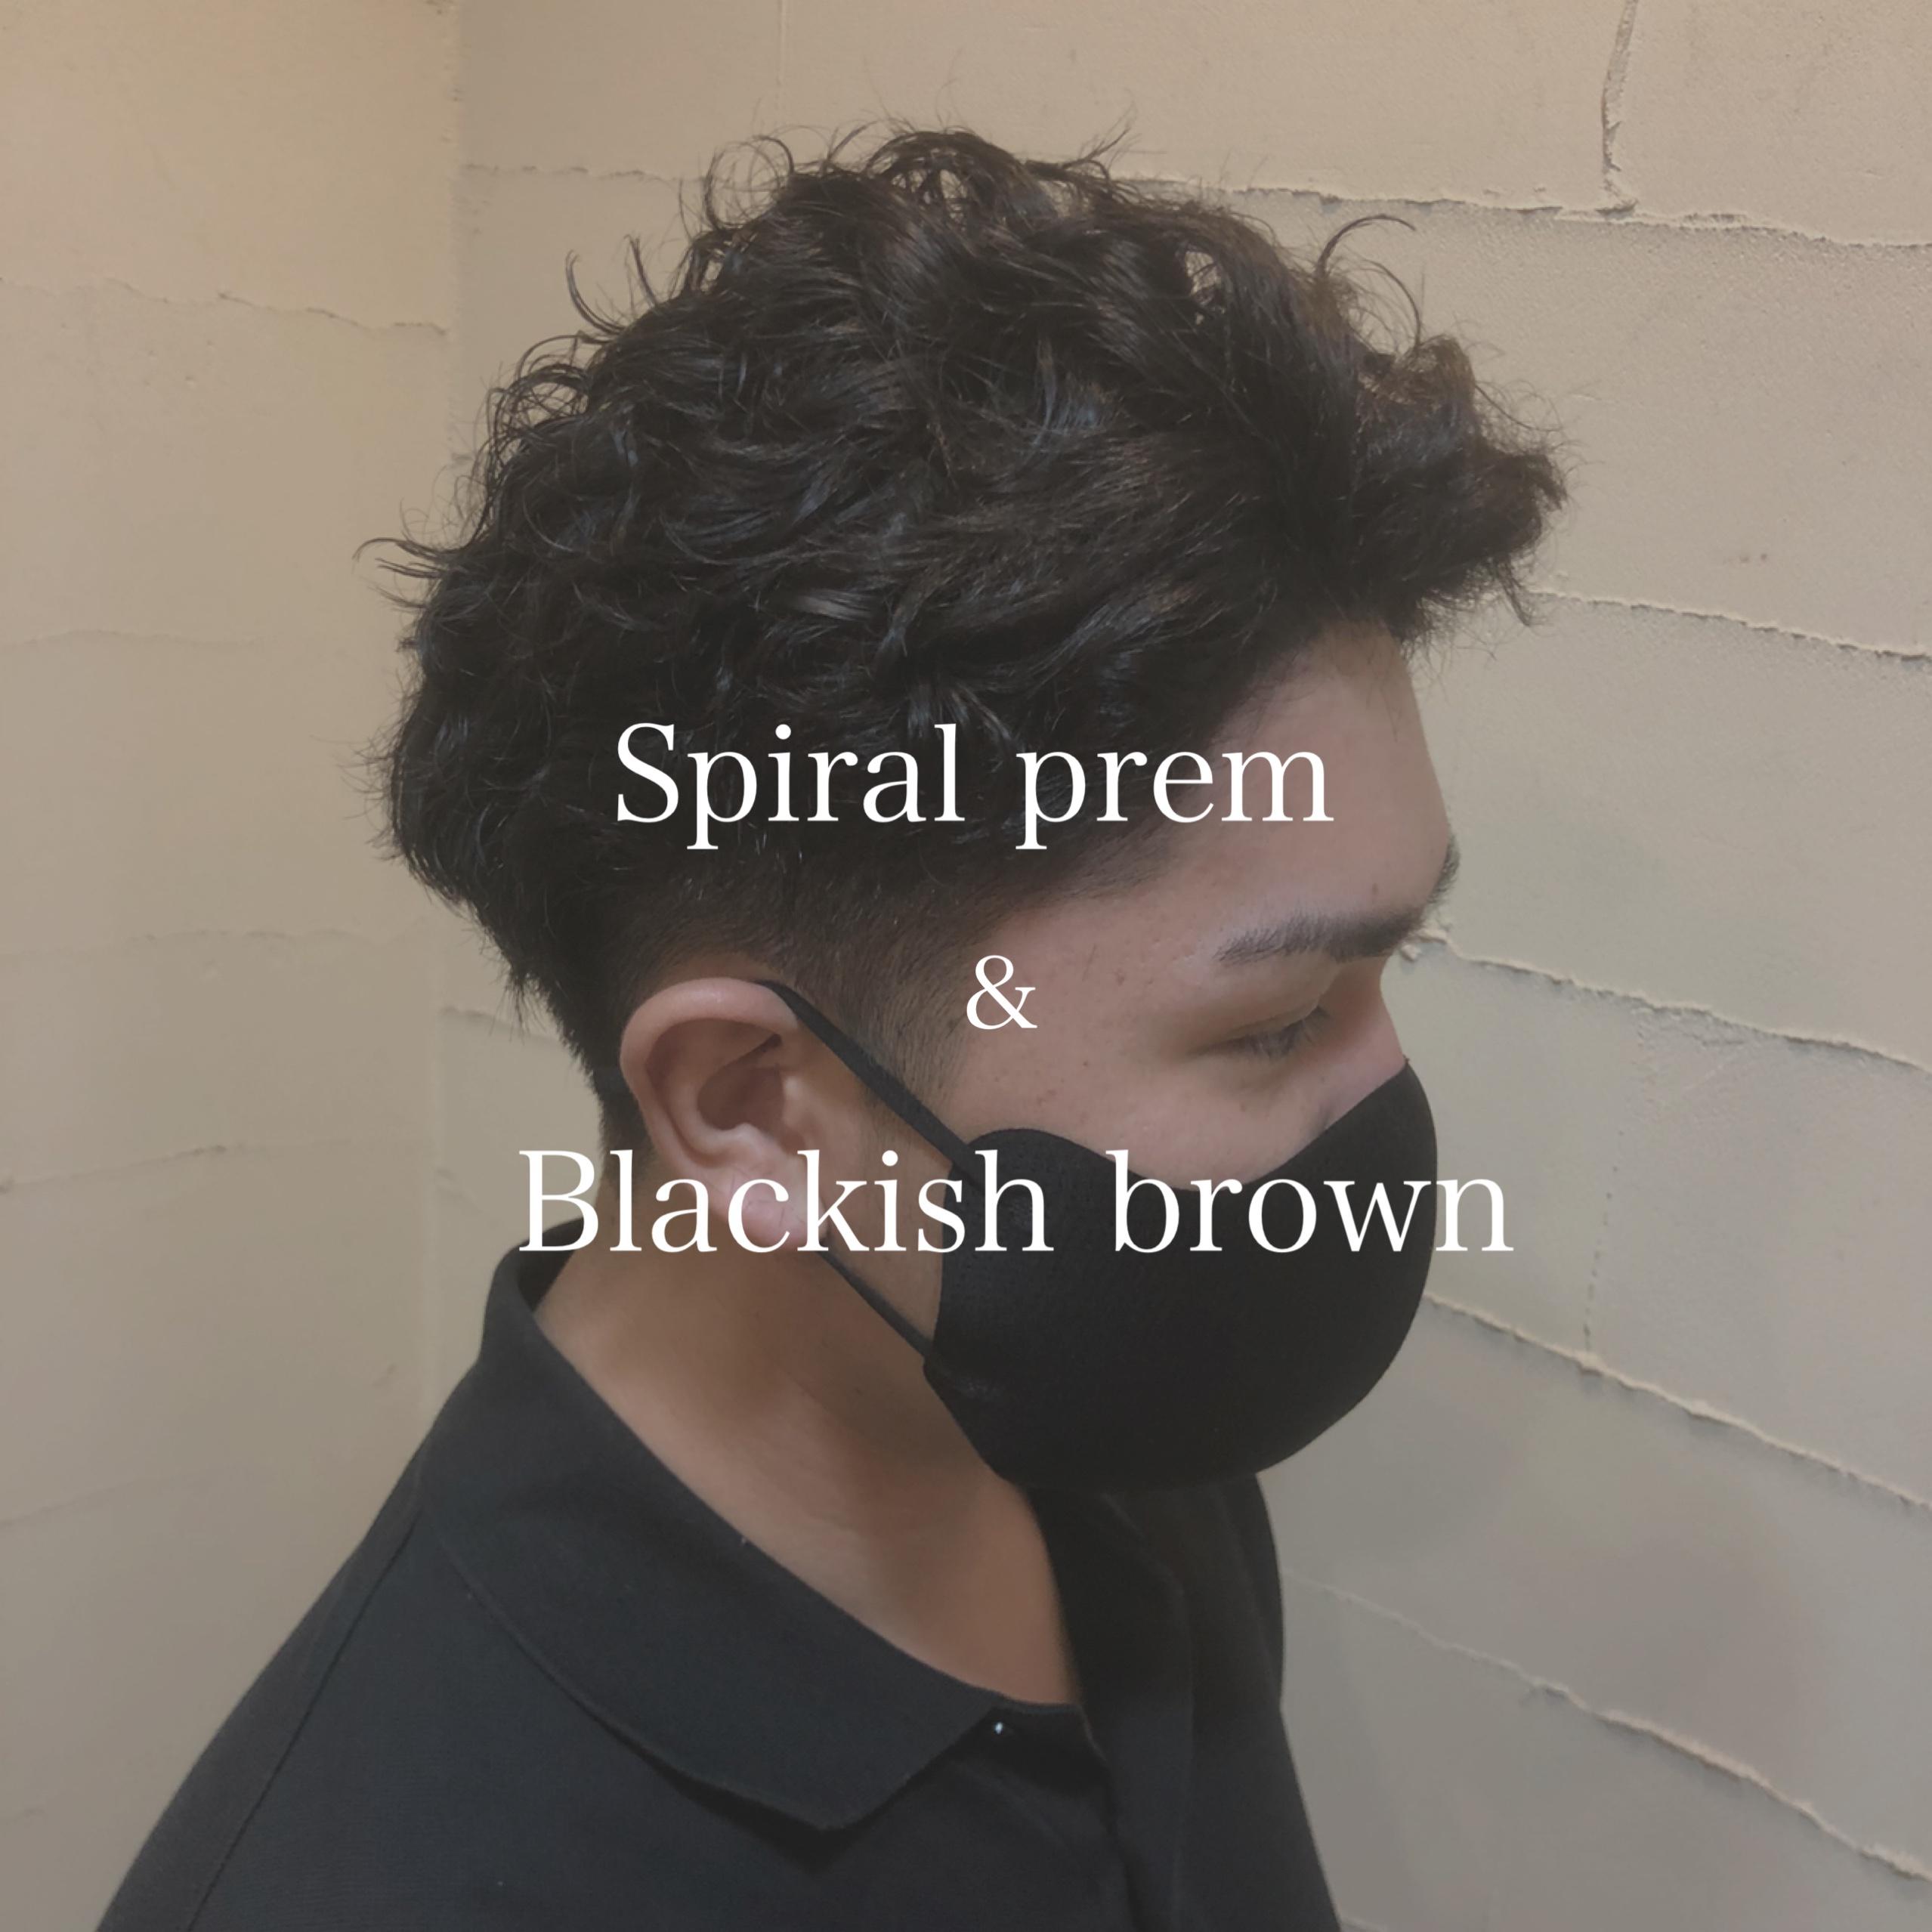 Spiral perm & Blackish brown✨